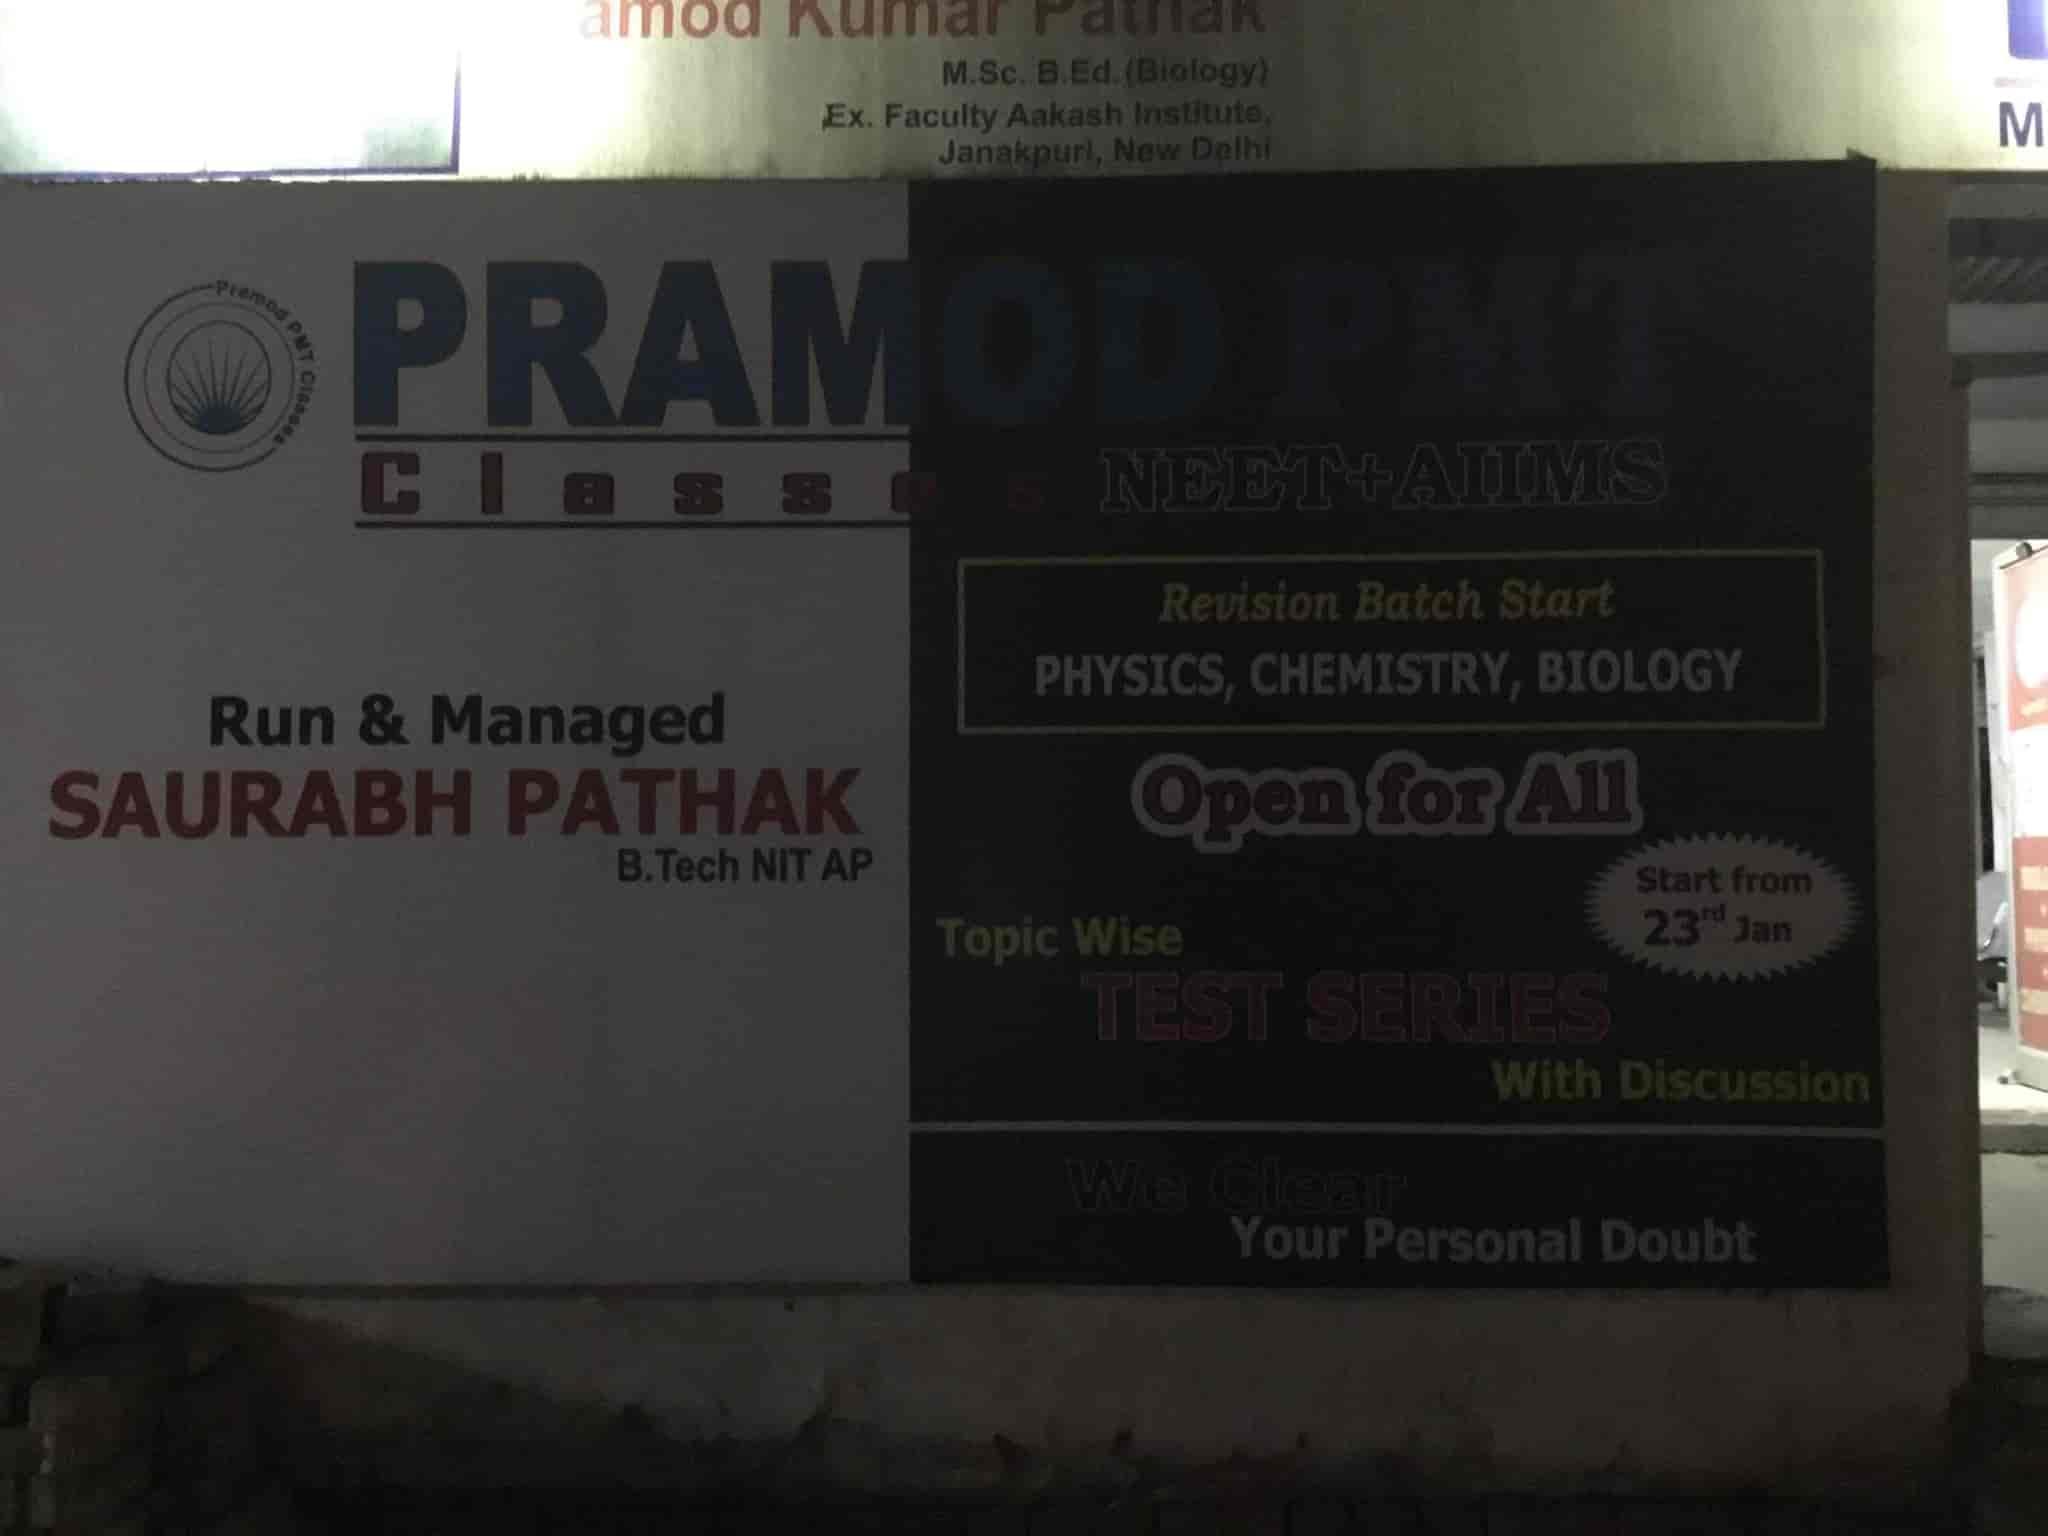 Pramod Pmt Classes, Kaka Deo - Neet Tutorials in Kanpur - Justdial